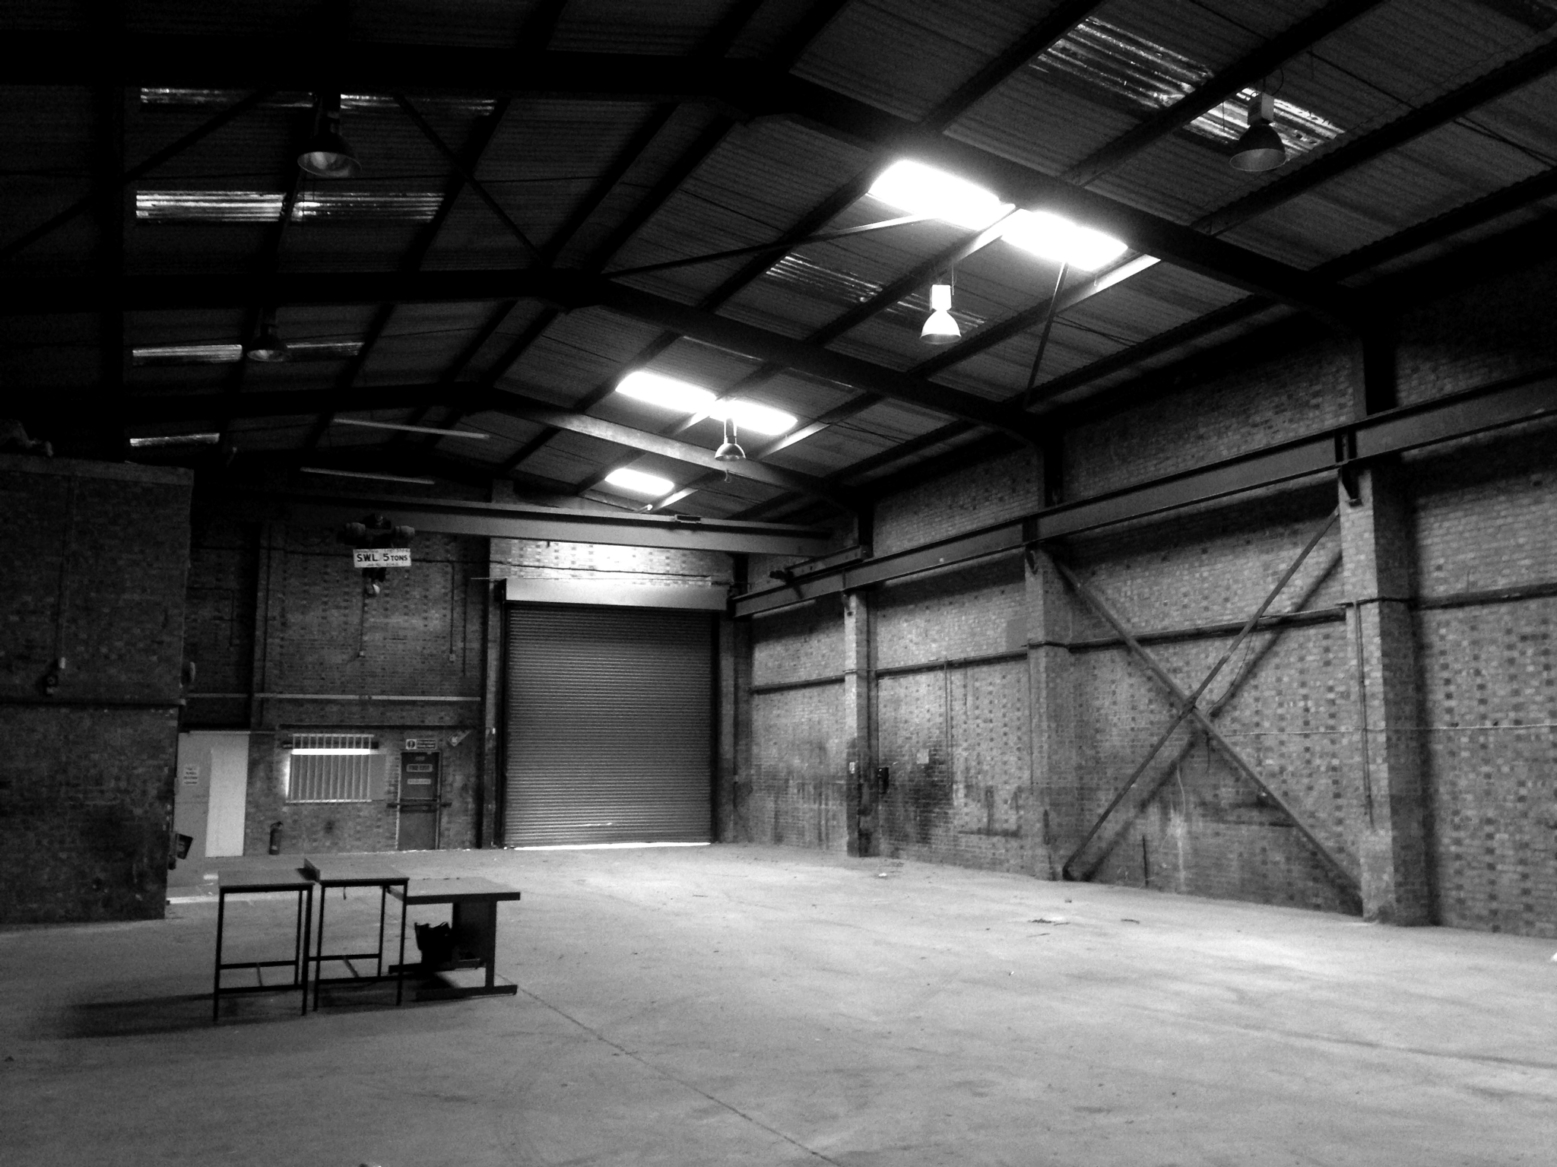 LPW warehouse